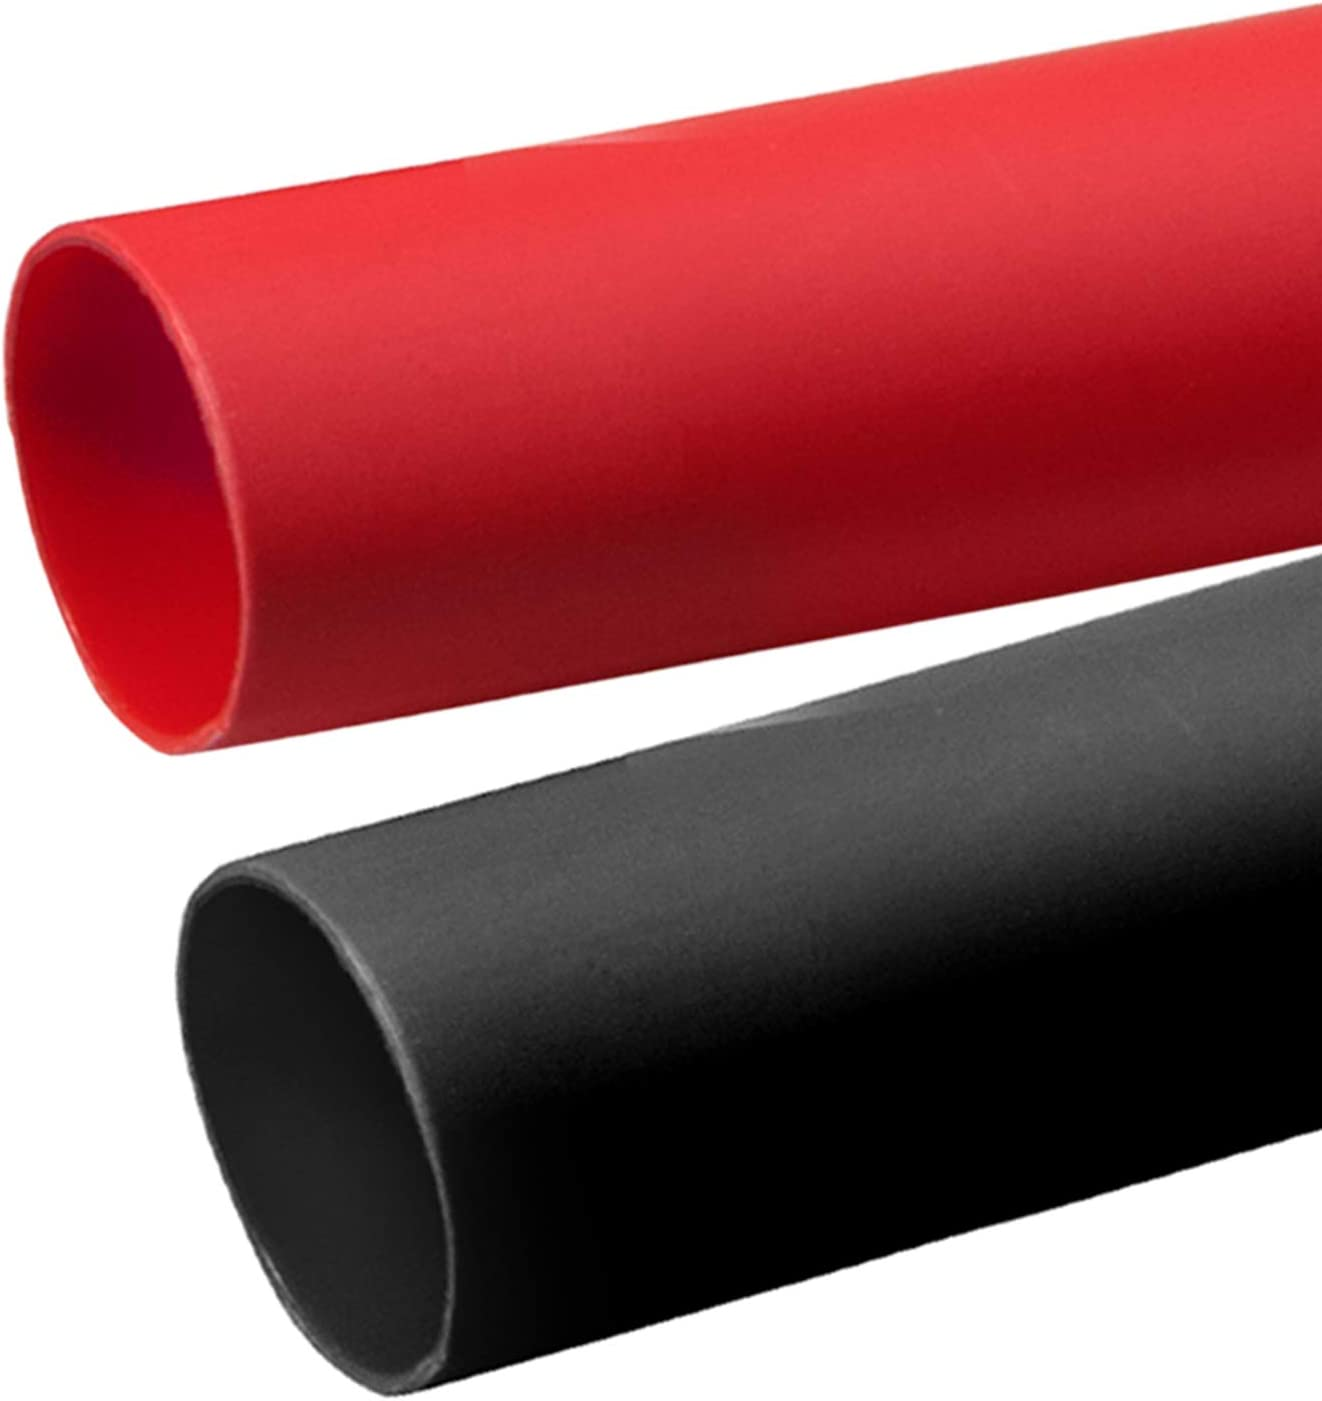 2 Pcs 3 4 inch 3:1 Tulsa Mall Over item handling Dual Shrink Wall Tubing La Heat Adhesive Kit